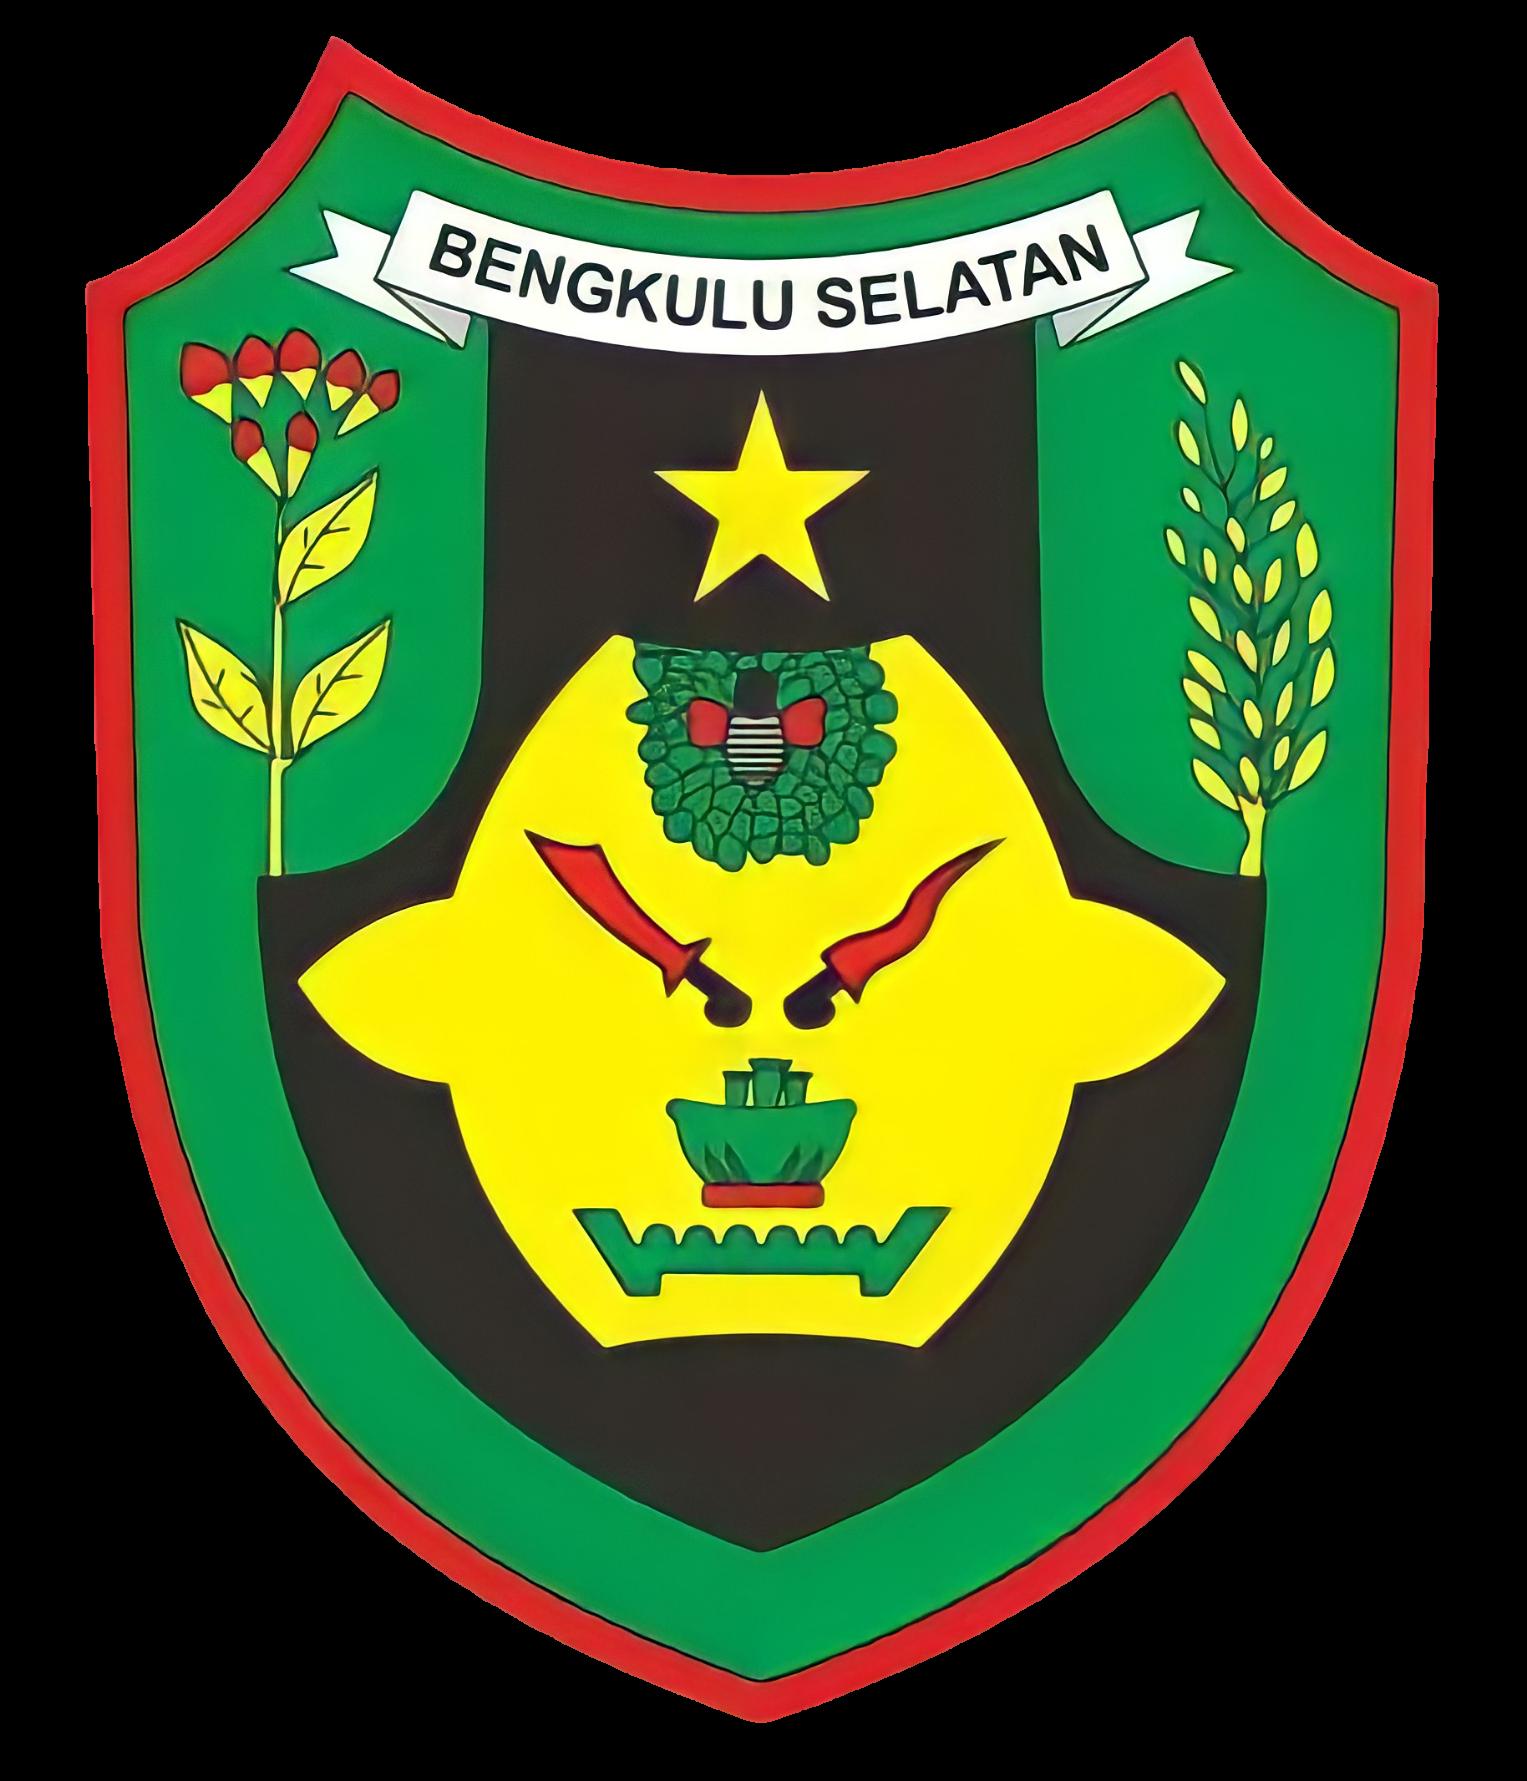 Hasil gambar untuk bengkulu selatan logo